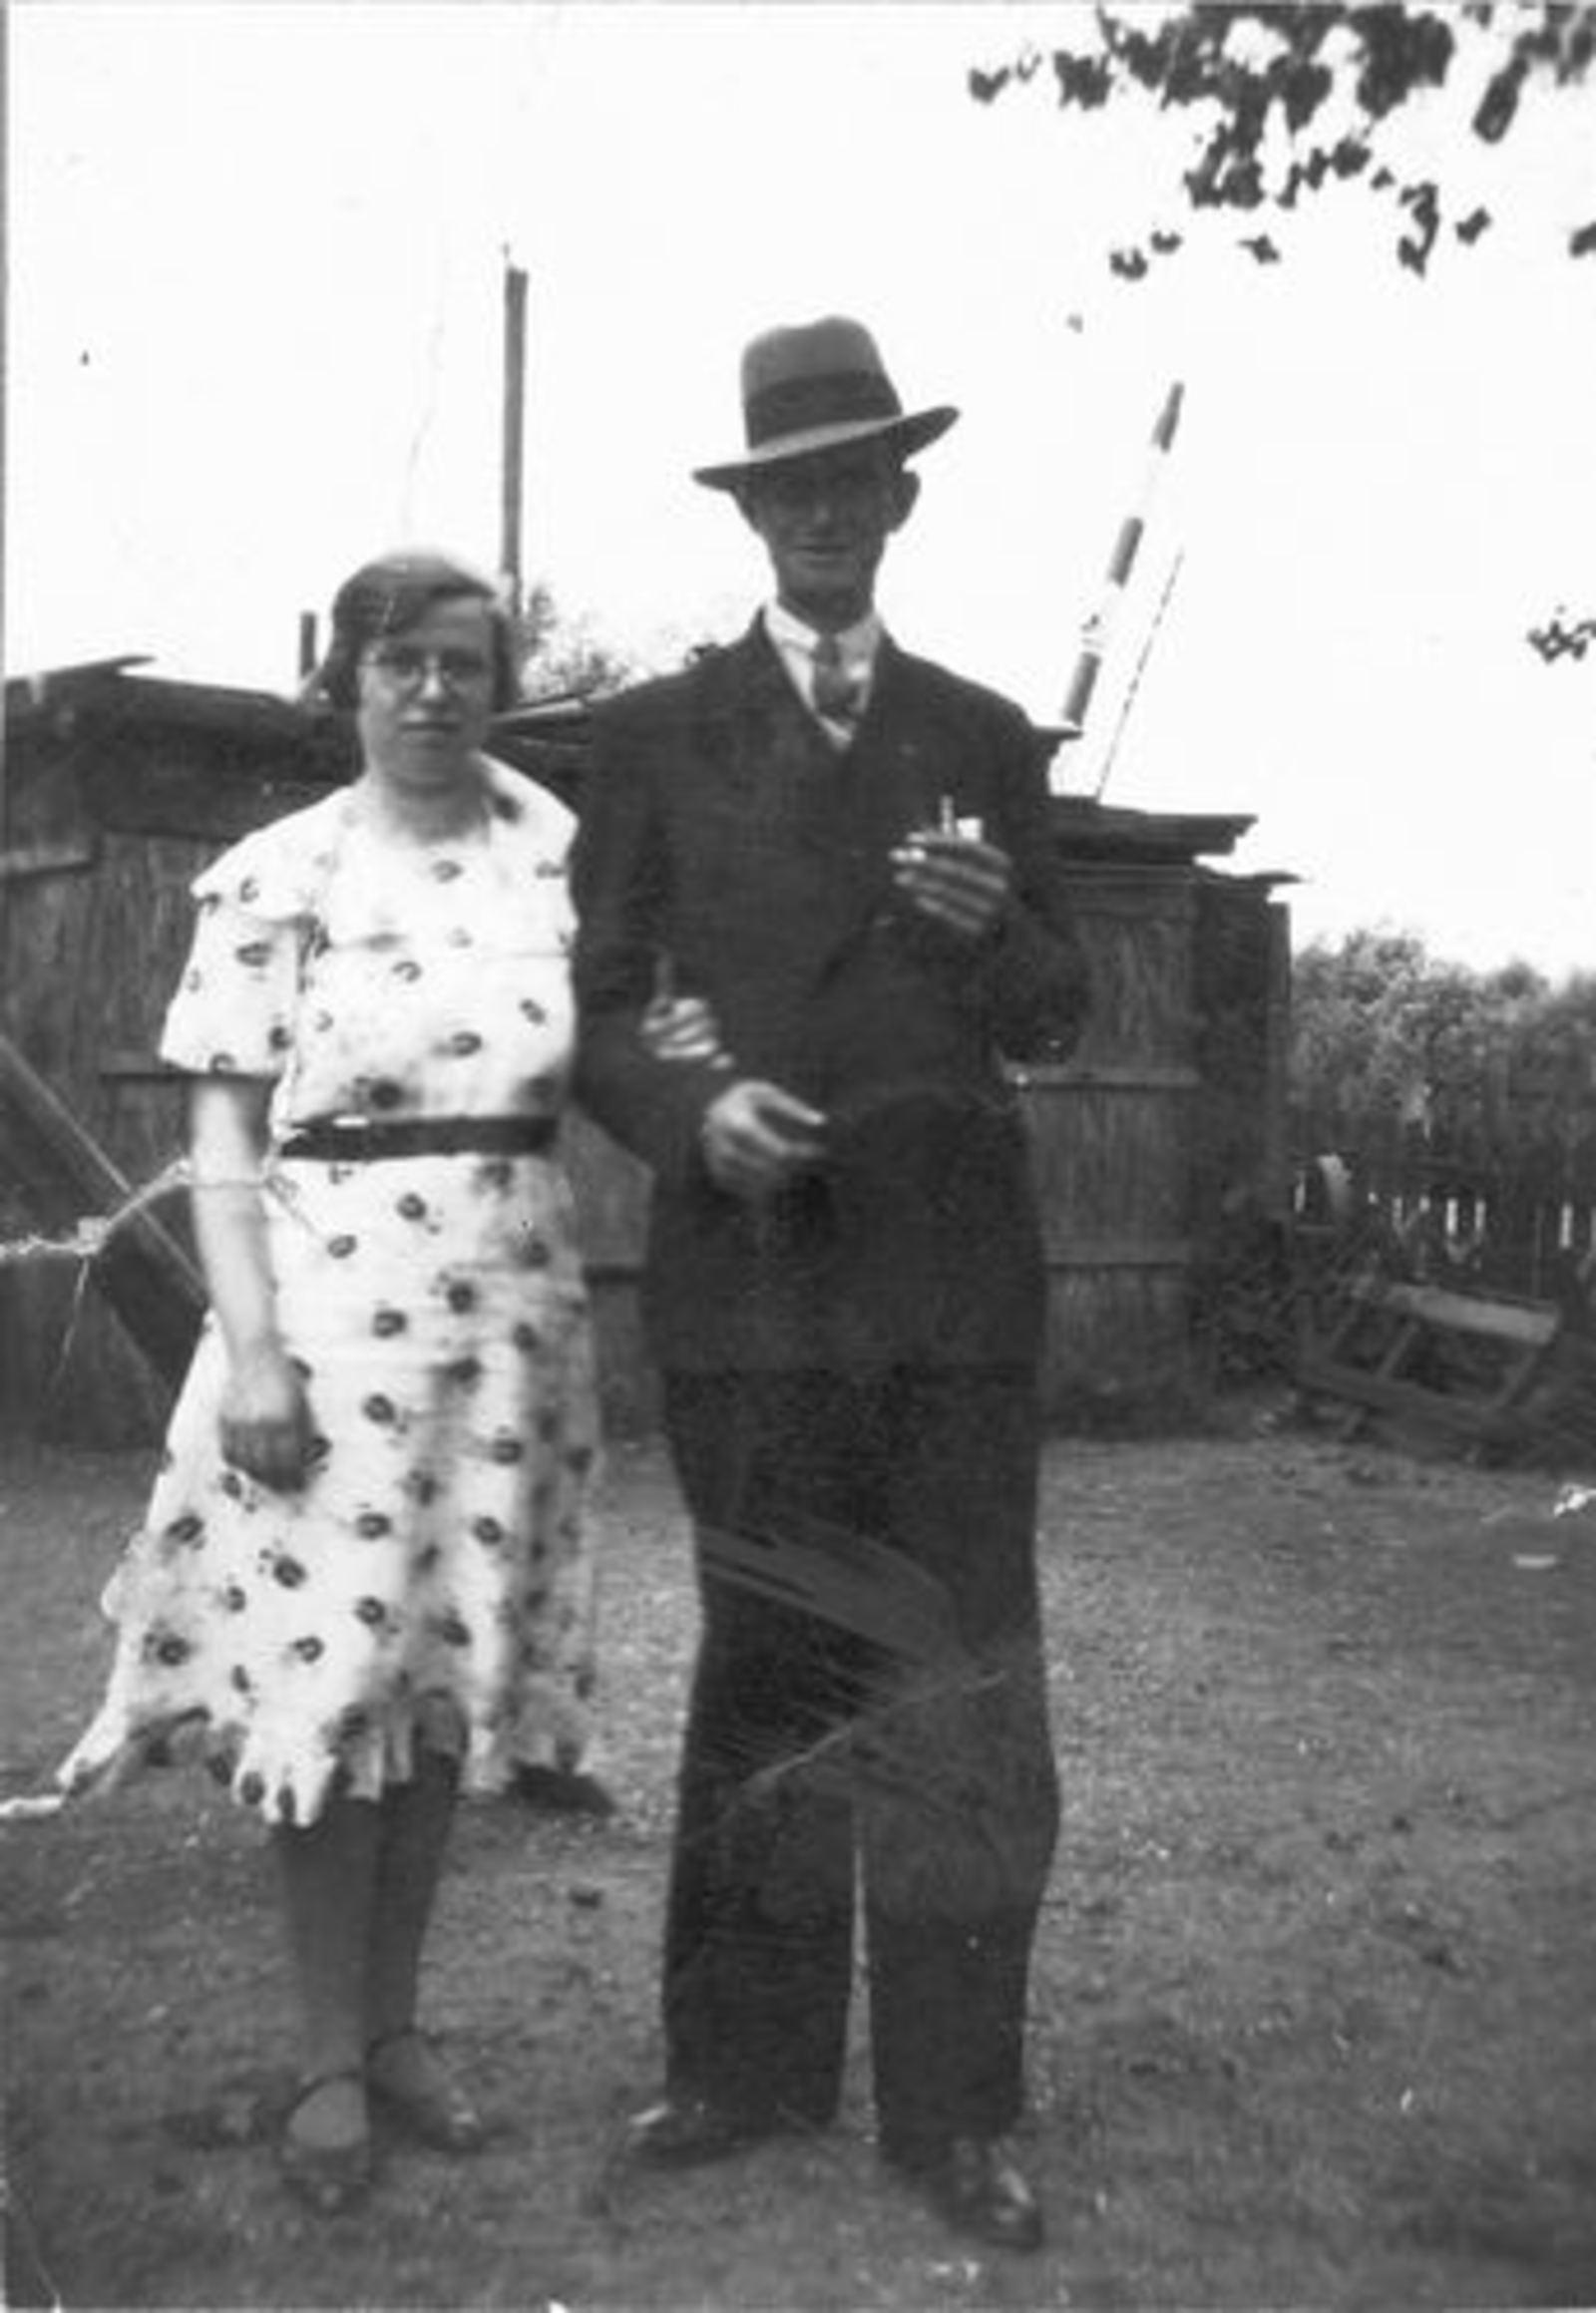 Stroomer Aafje 1912 19__ buiten met man Roel Hoogeboom